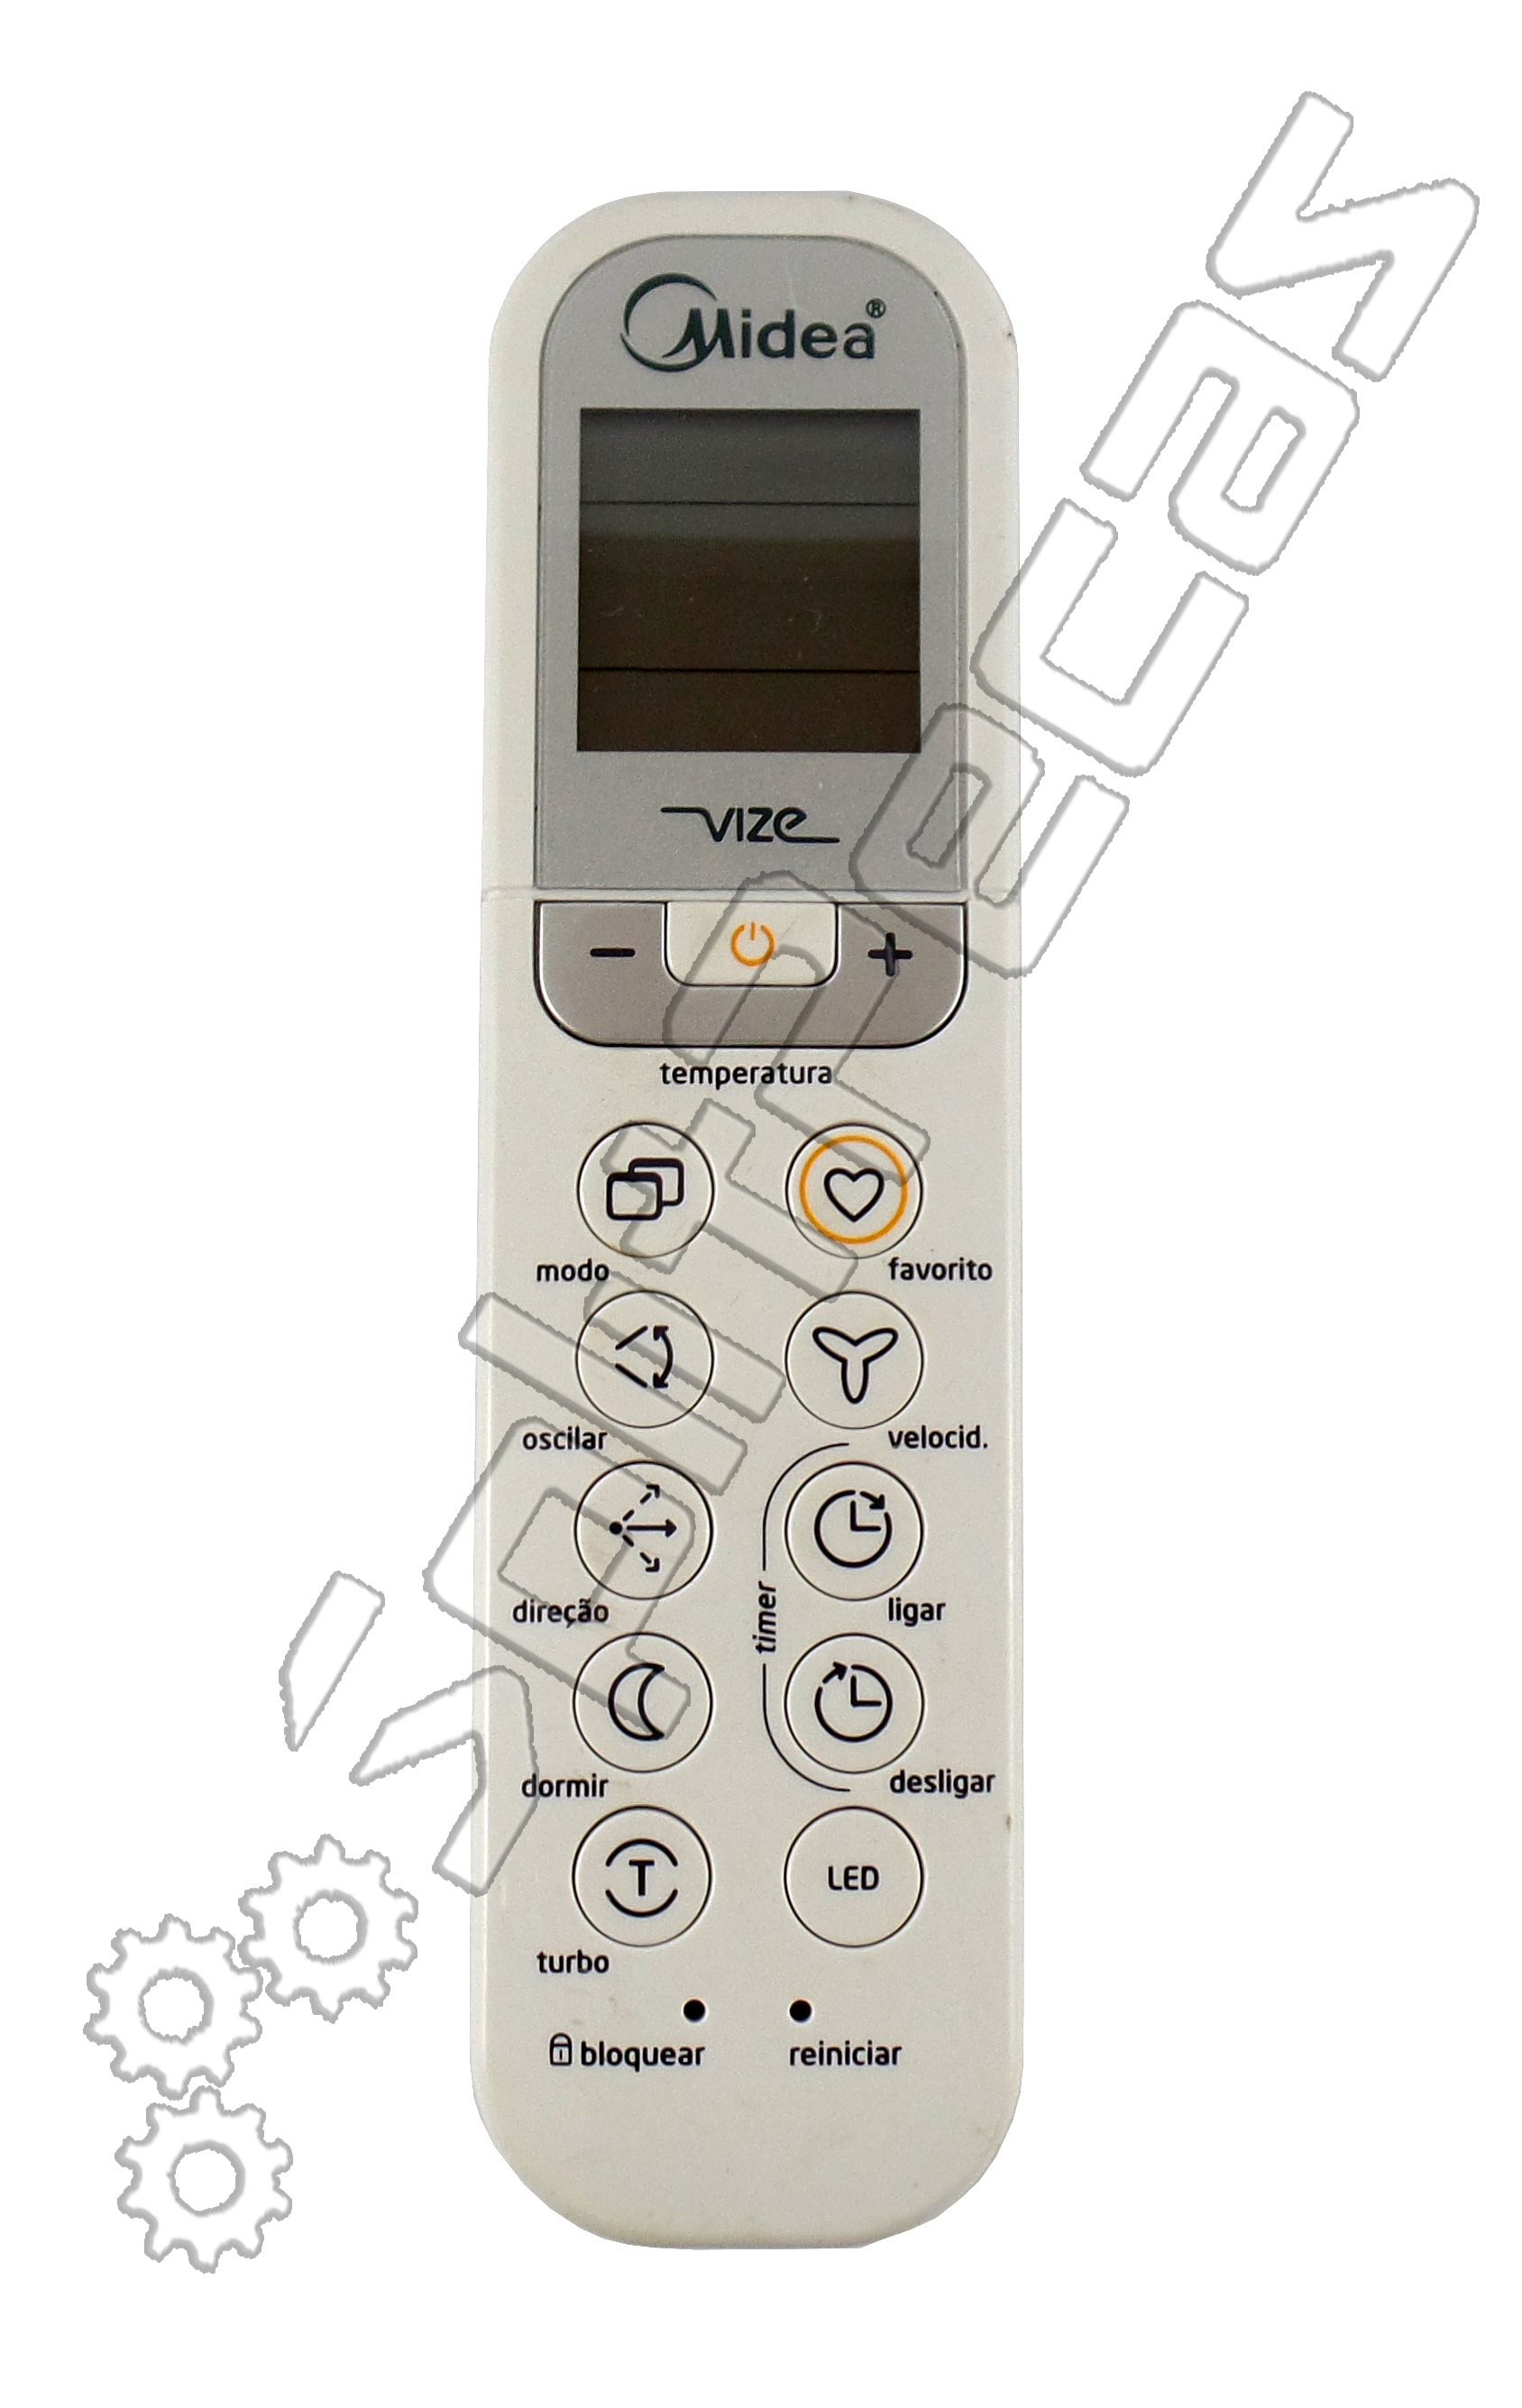 Controle Remoto do Ar Condicionado Midea Vize  9.000 a  24.000  Btus  06320056